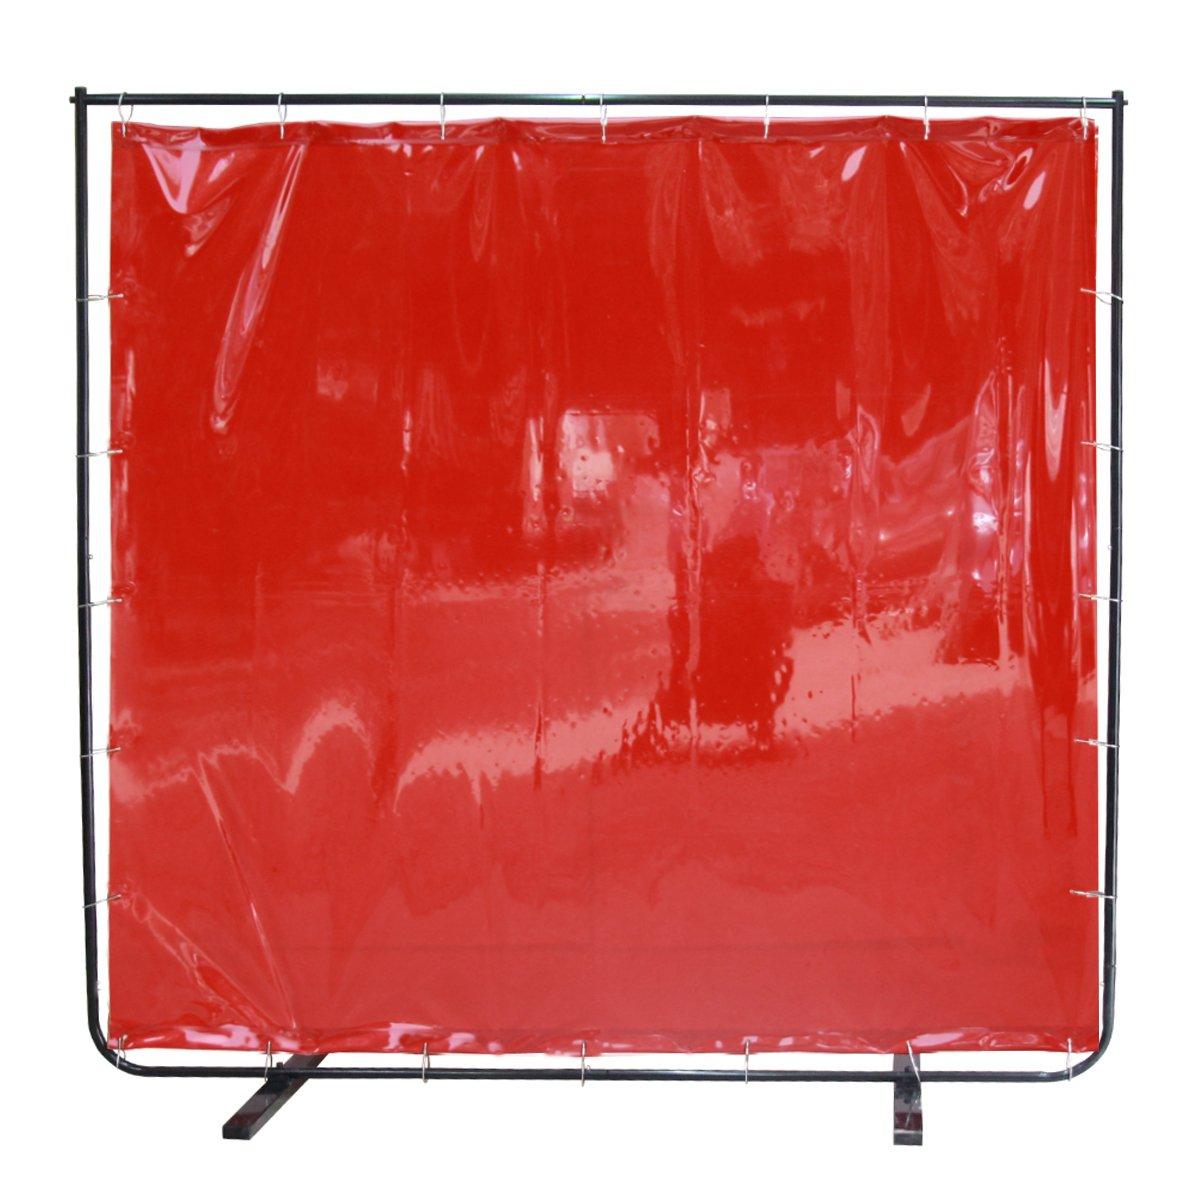 VIZ-PRO Red Vinyl Welding Curtain/Welding Screen With Frame, 6' x 6' by VIZ-PRO (Image #2)